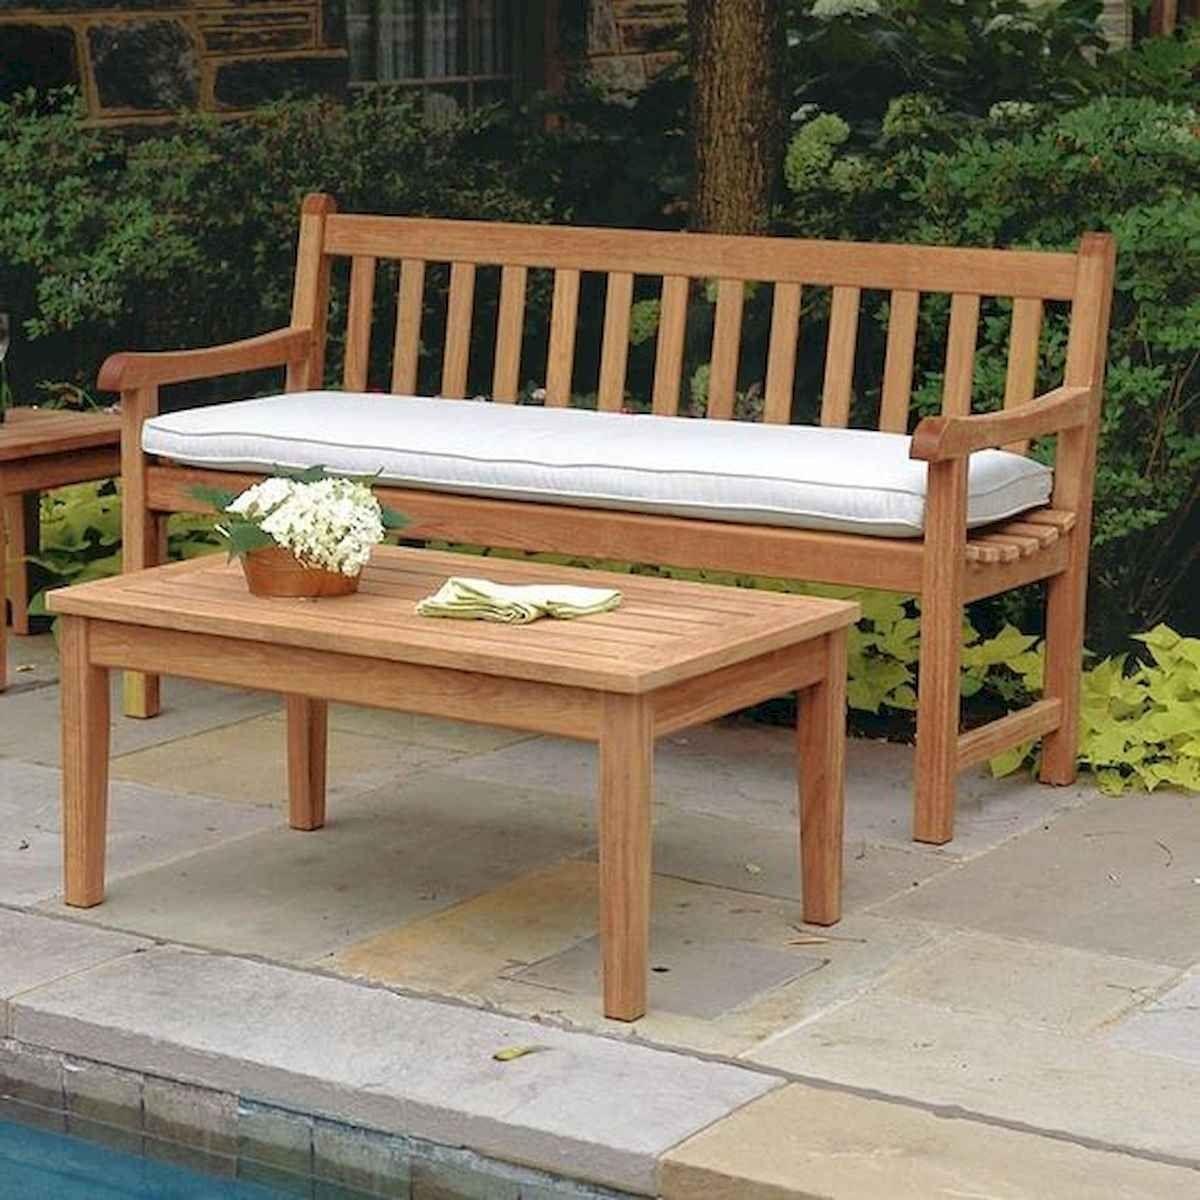 60 Amazing Diy Projects Outdoors Furniture Design Ideas Sofa De Madeira Rustico Biombos Decoracao Sofa De Madeira